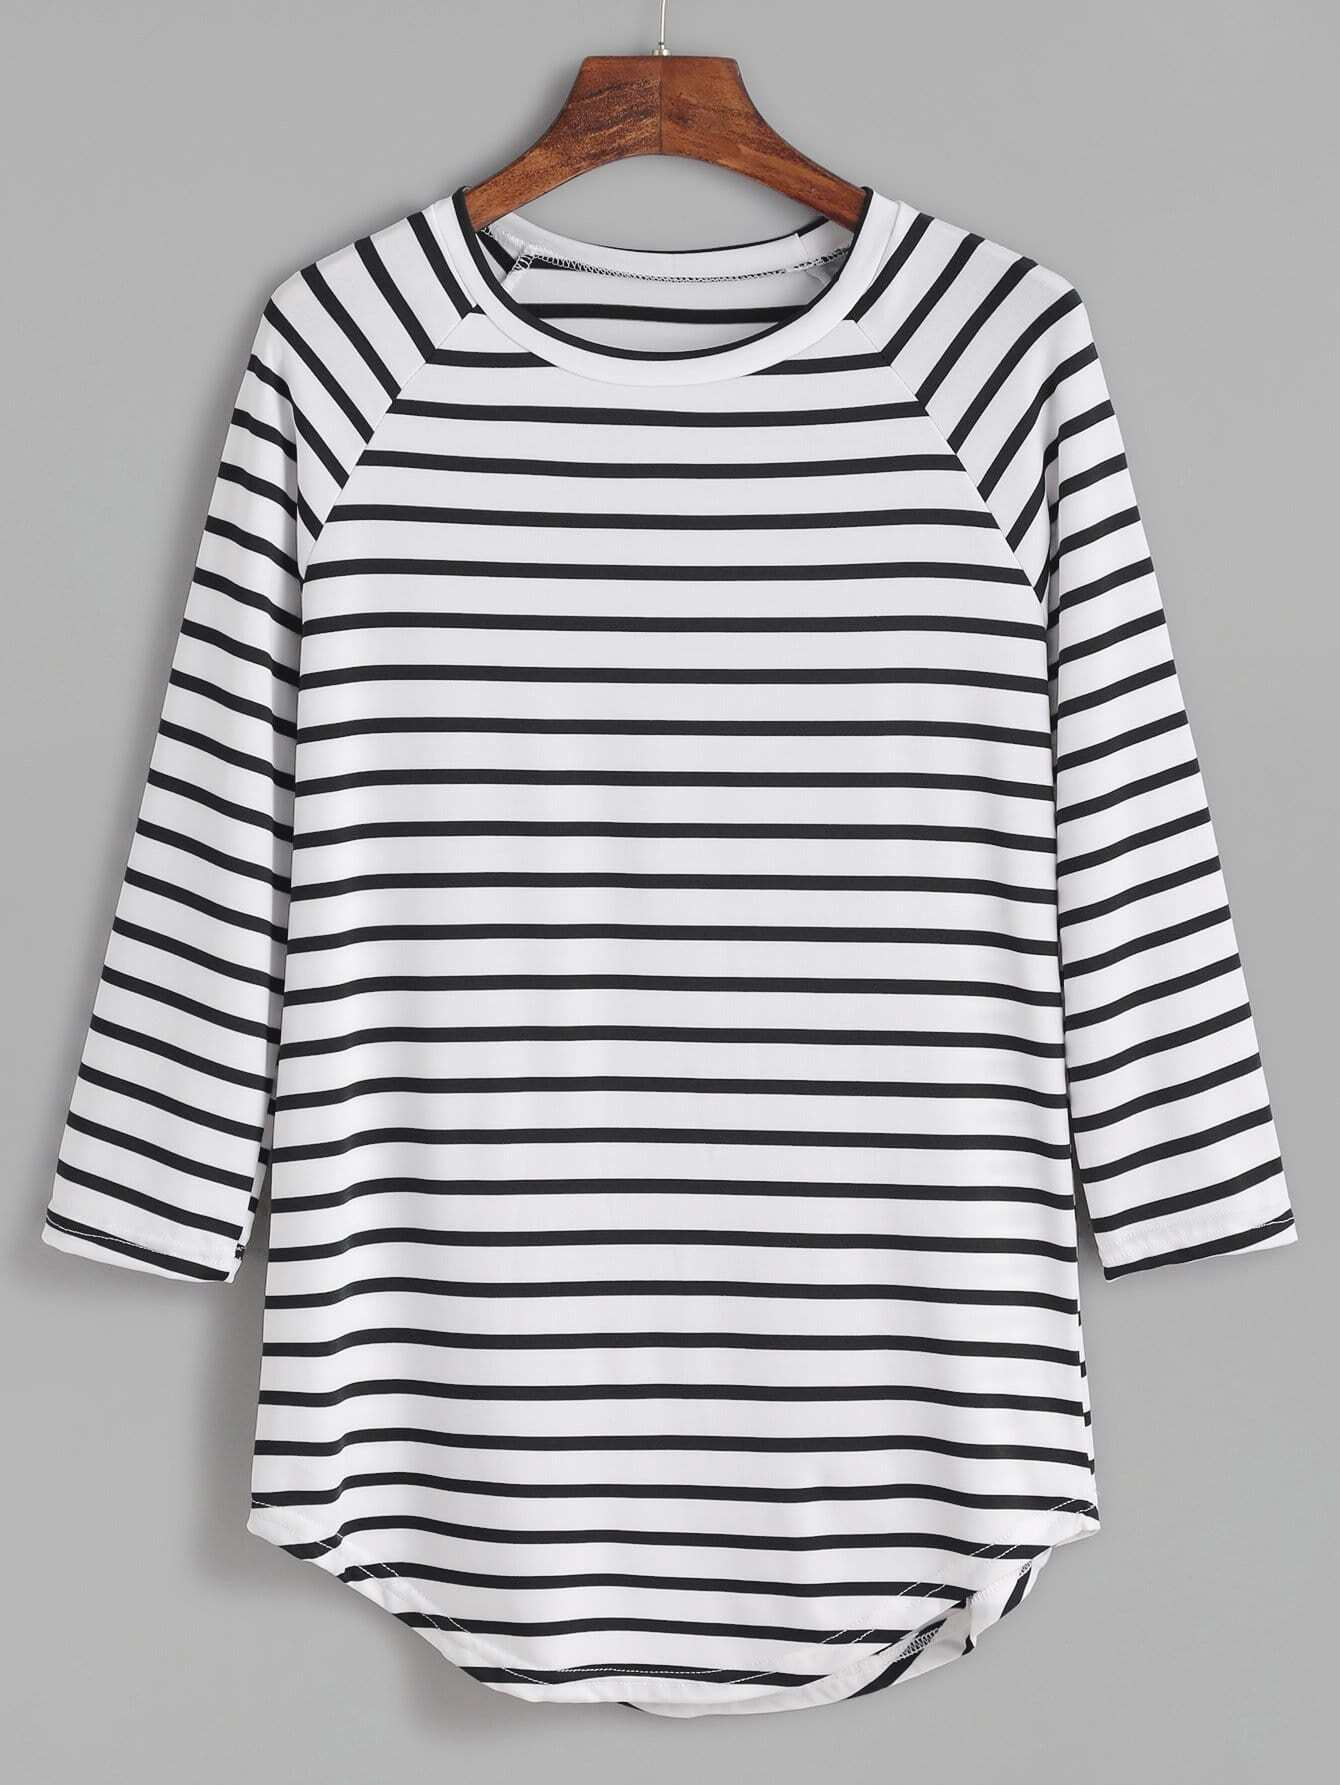 Striped Raglan Sleeve Curved Hem T-shirt striped elbow patch curved hem t shirt